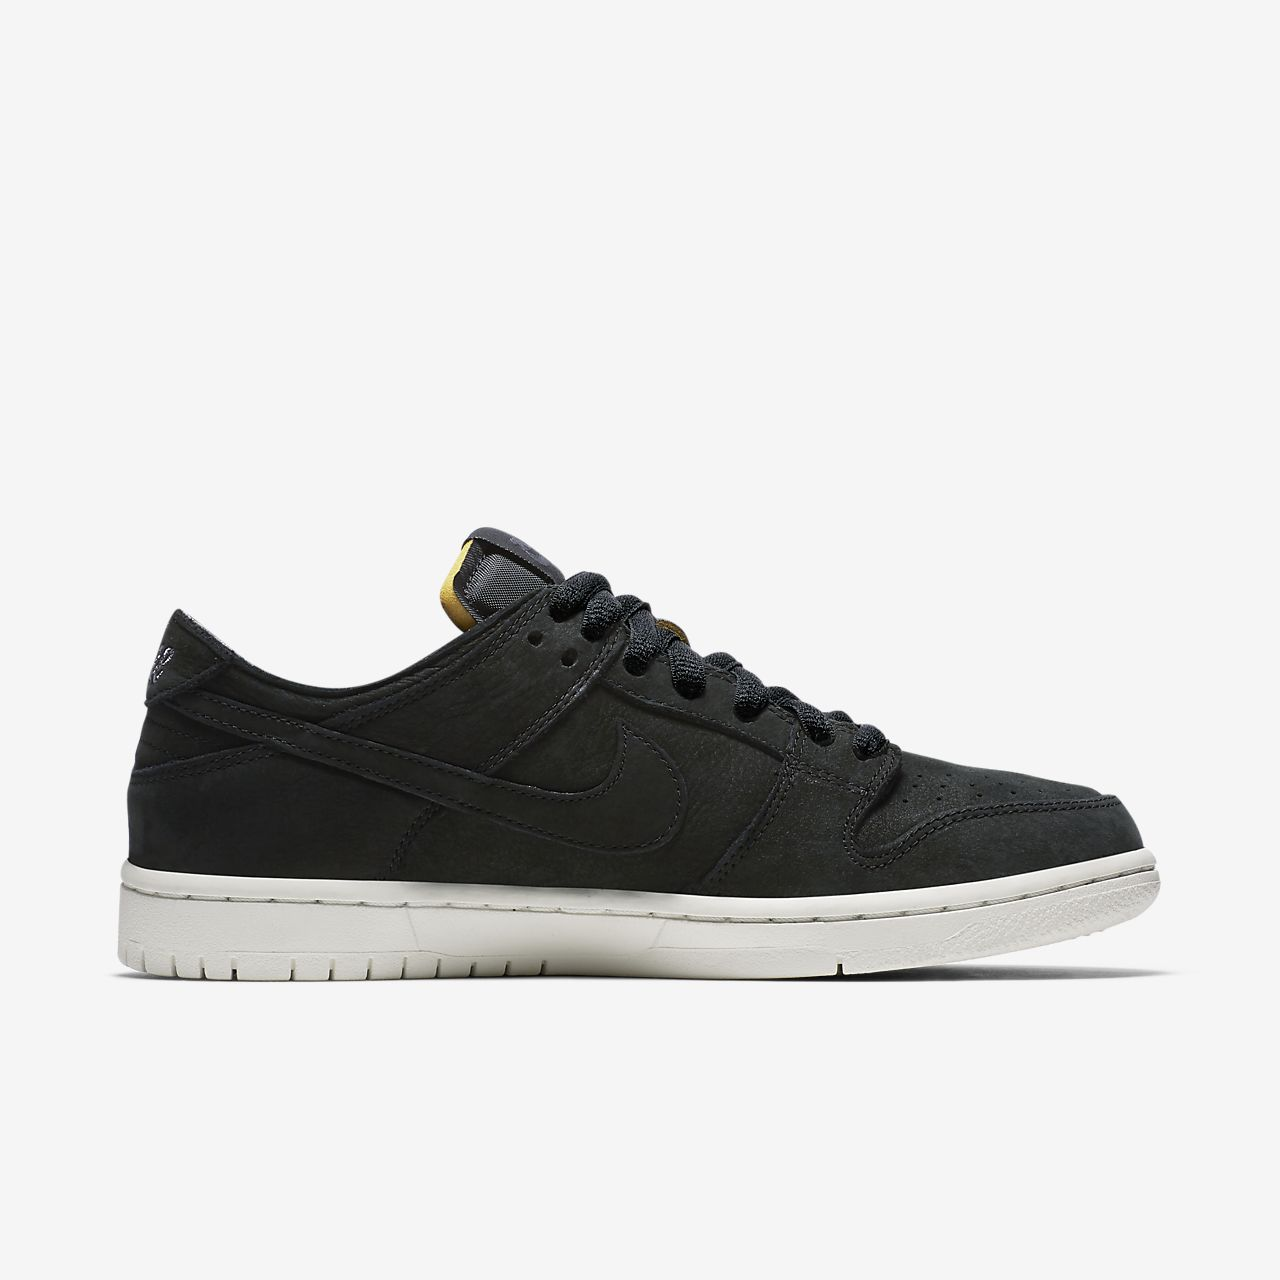 Nike Dunk Chaussures Bas Pour Les Hommes LO5spf